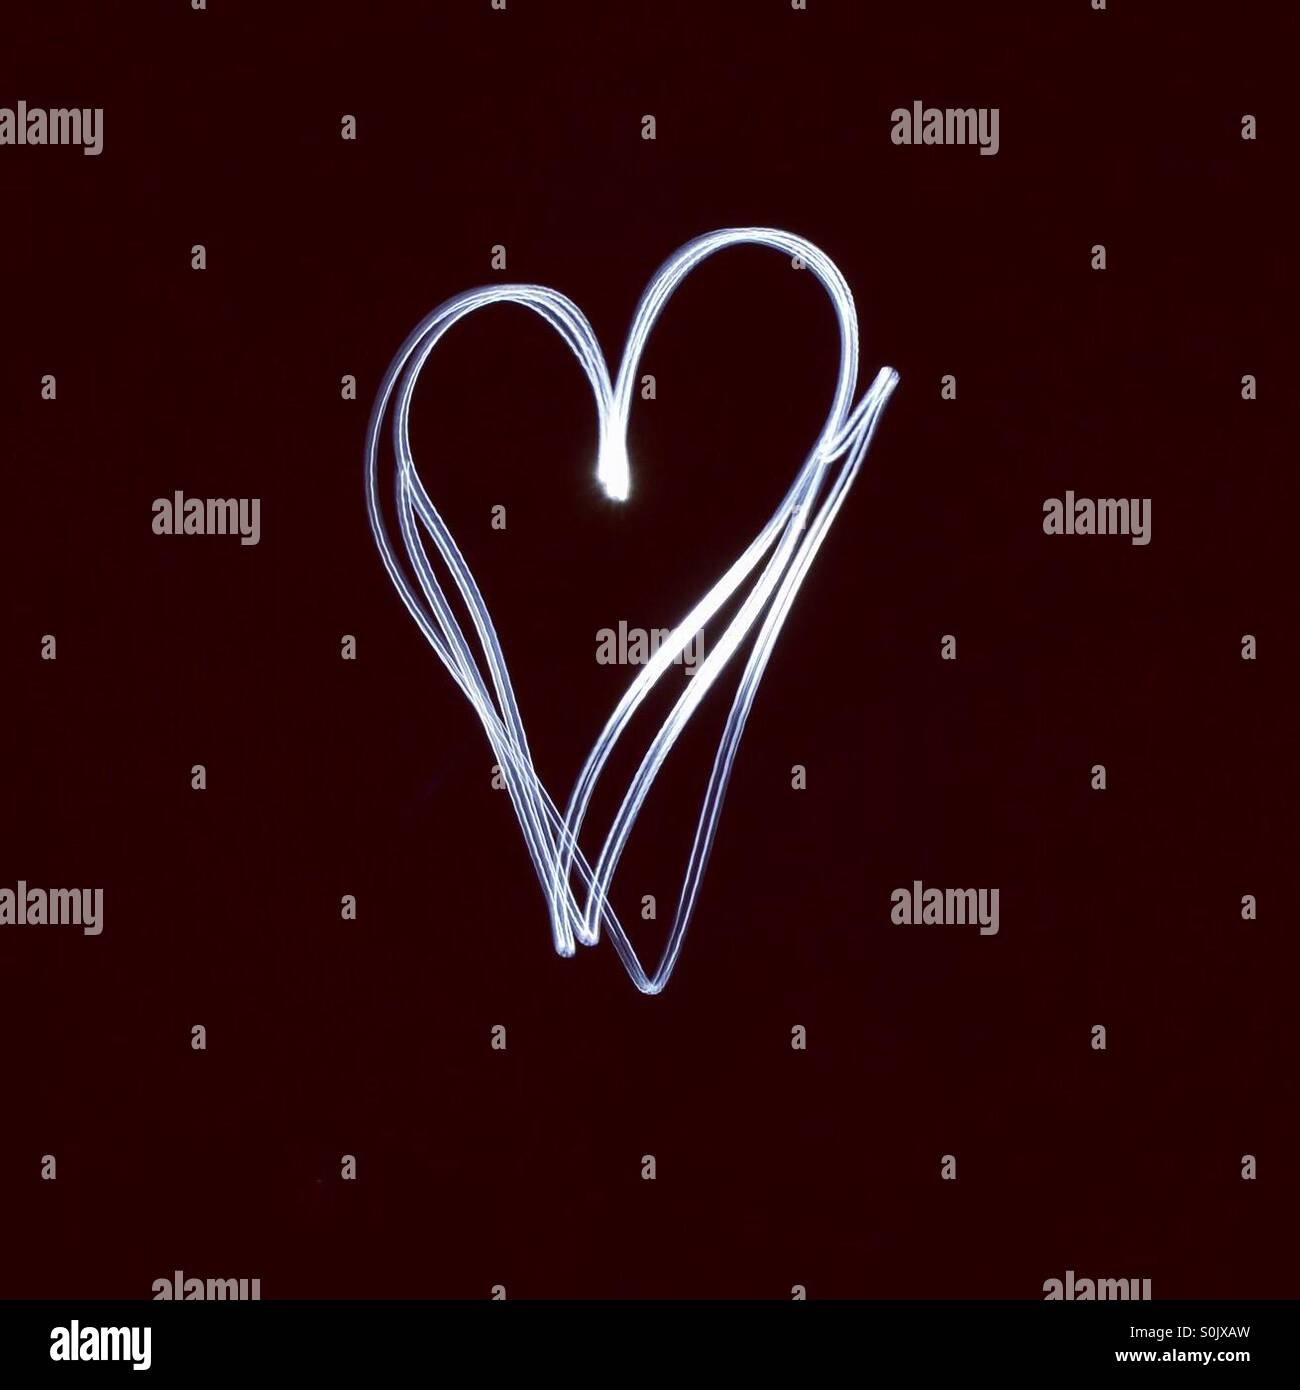 Light painting heart shape - Stock Image